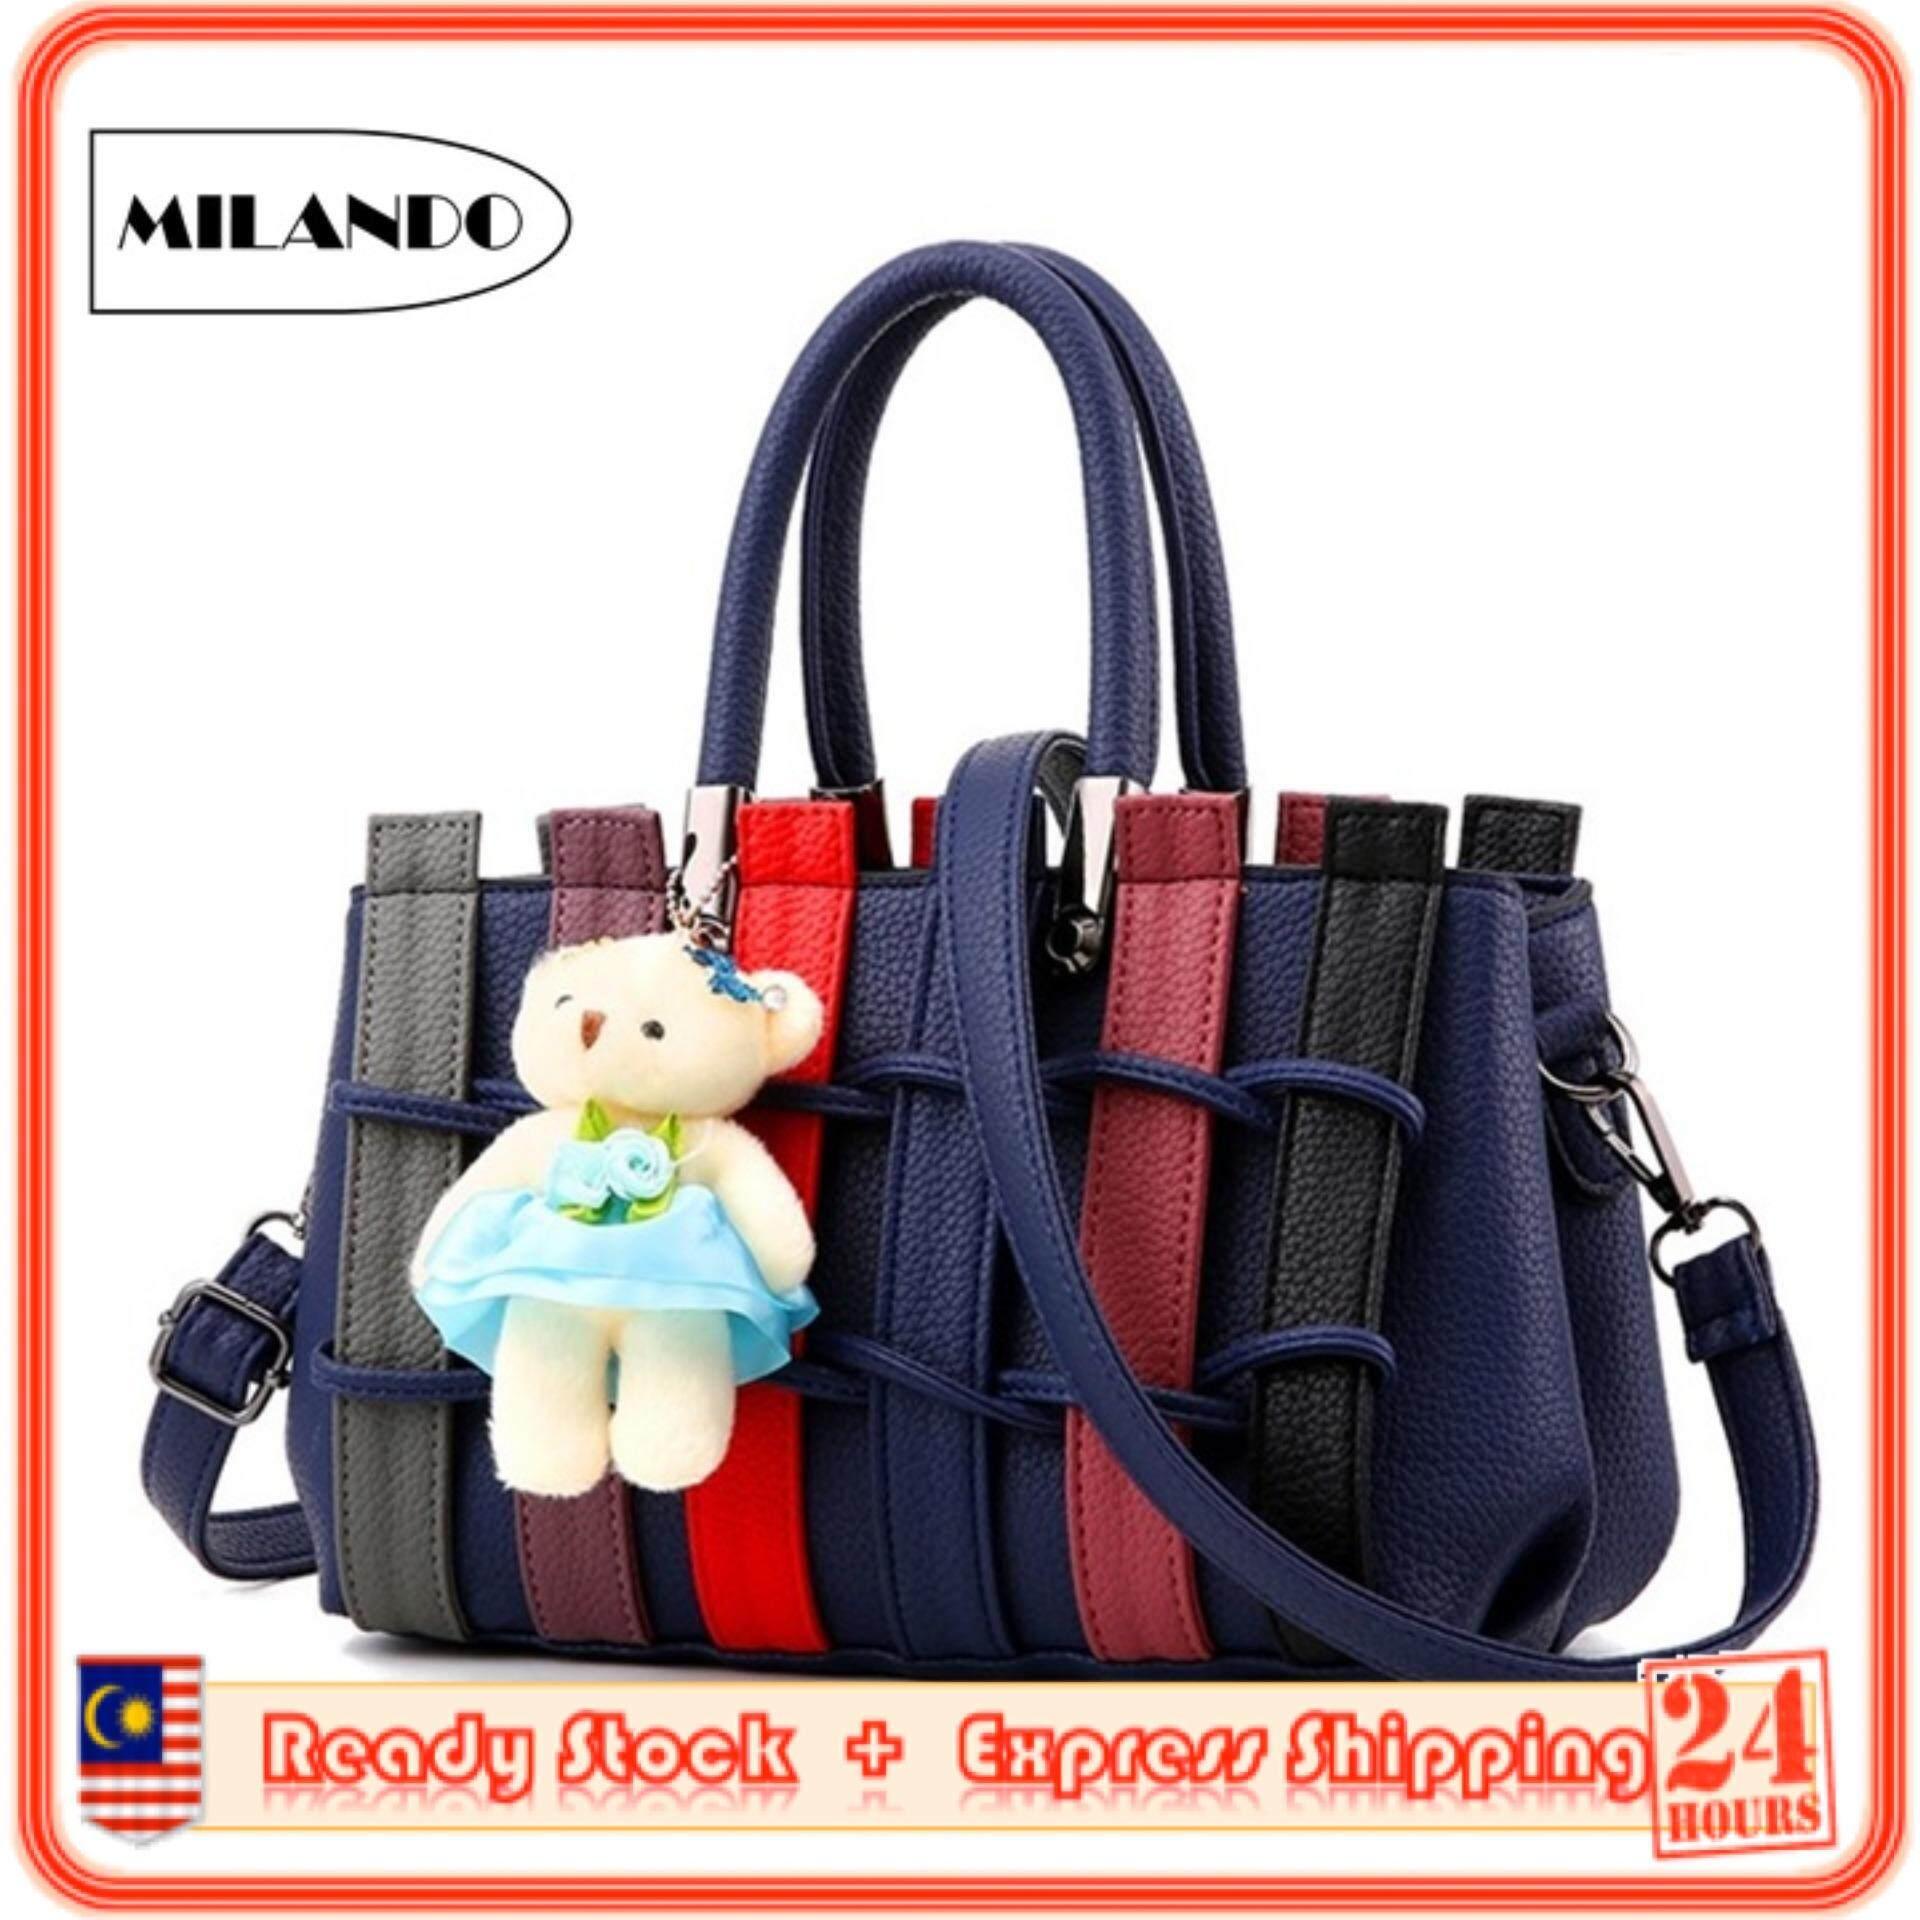 009e41c6e638 MILANDO Ladies Women PU Leather Handbag Tote Sling Bag Handbeg Beg Wanita  (Type 8)